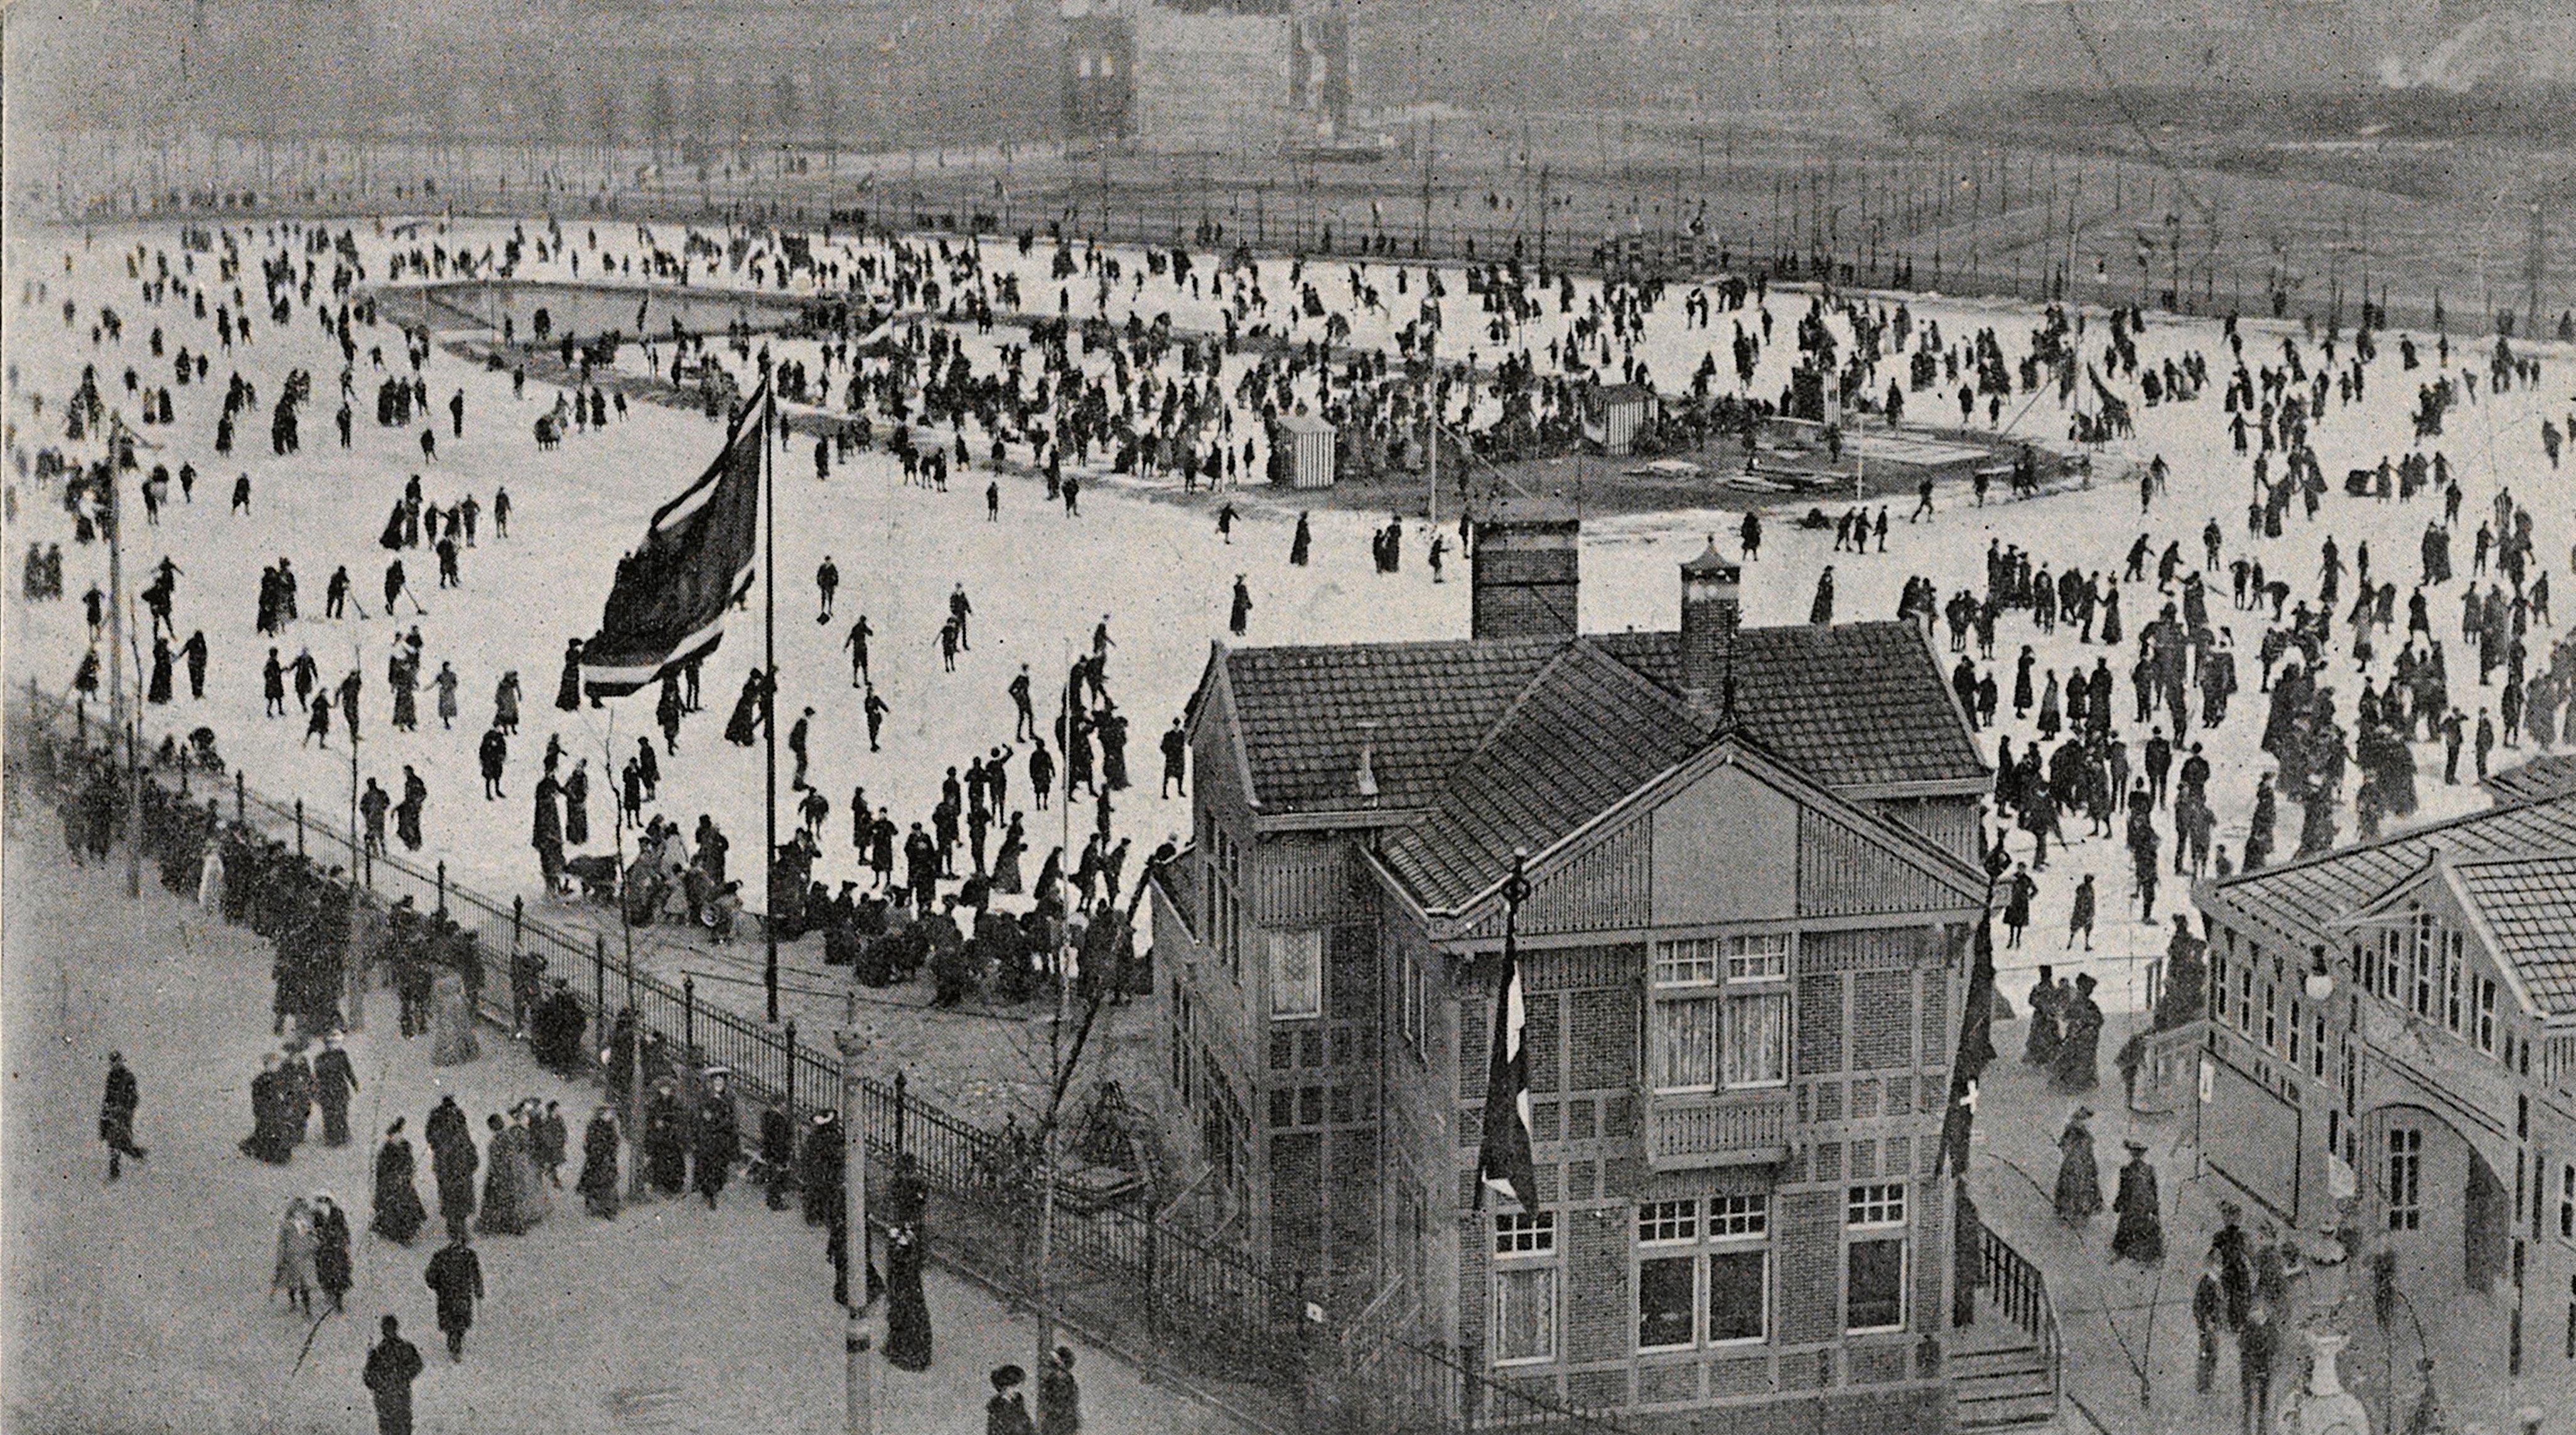 museumplein, ijsclub. uitgave n.j. boon, amsterdam (cropped).jpg